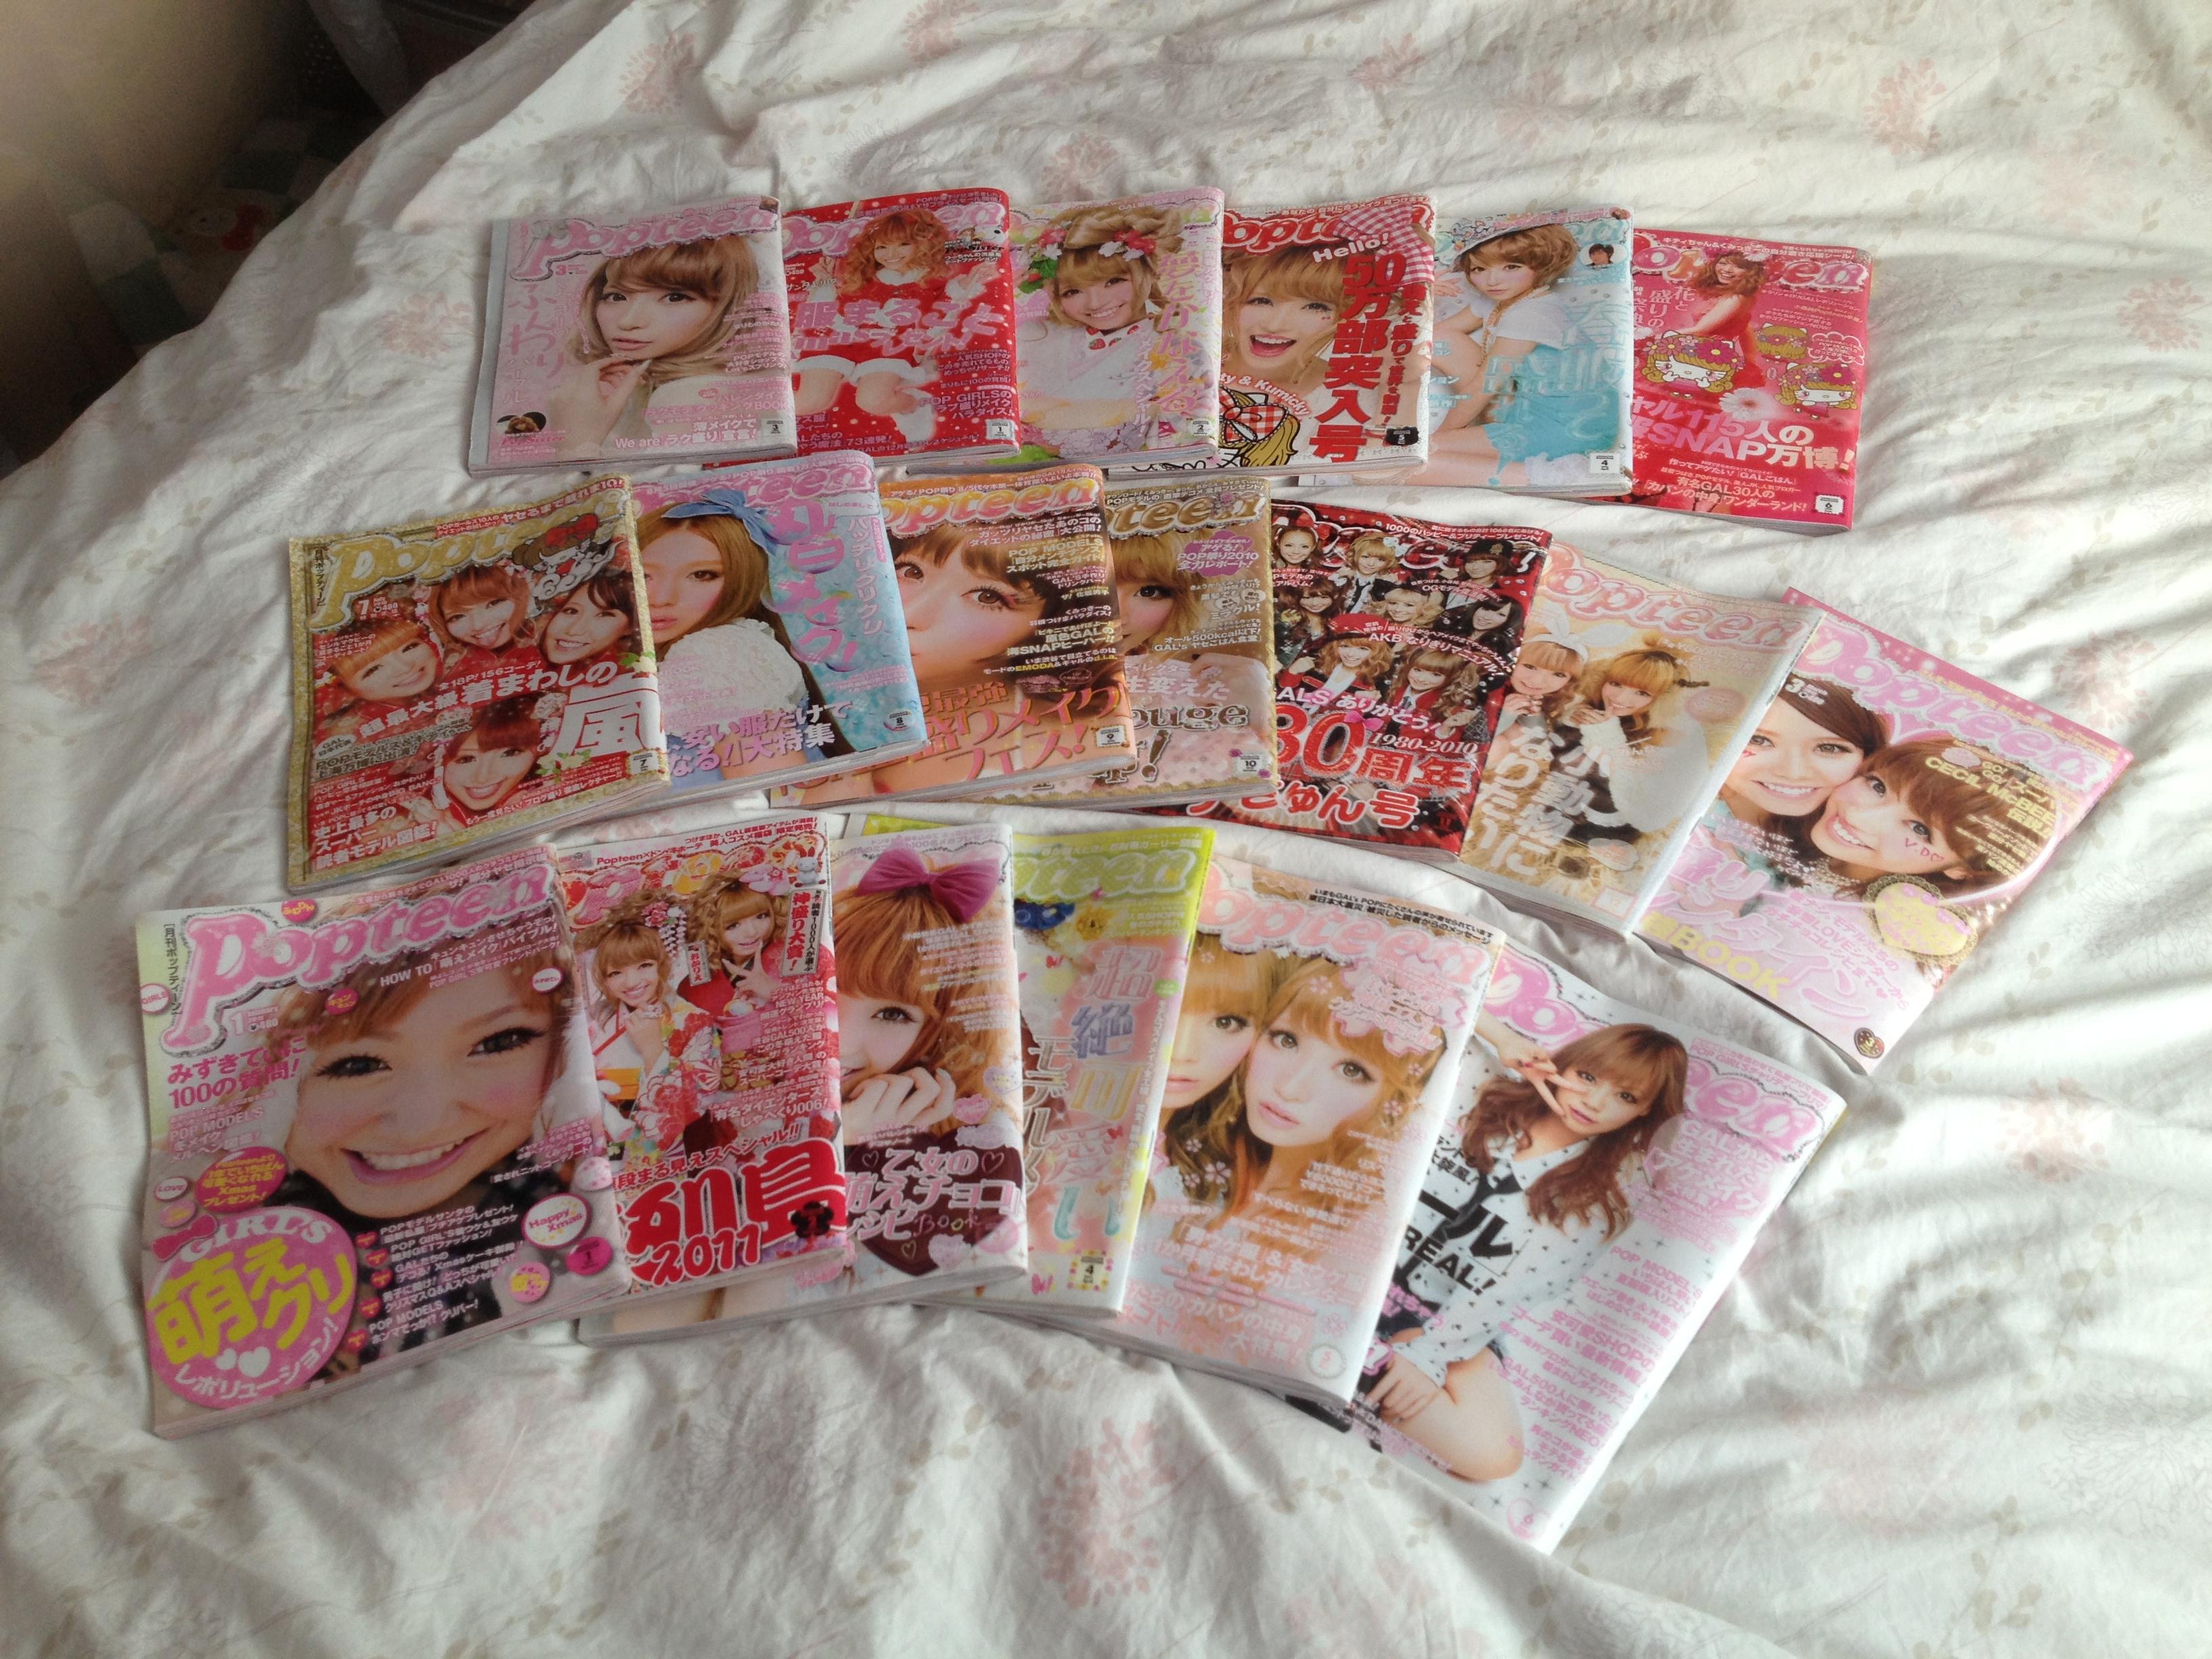 Popteen Japanese Teen Gyaru Girl Magazines One Year Series 2010, 2011